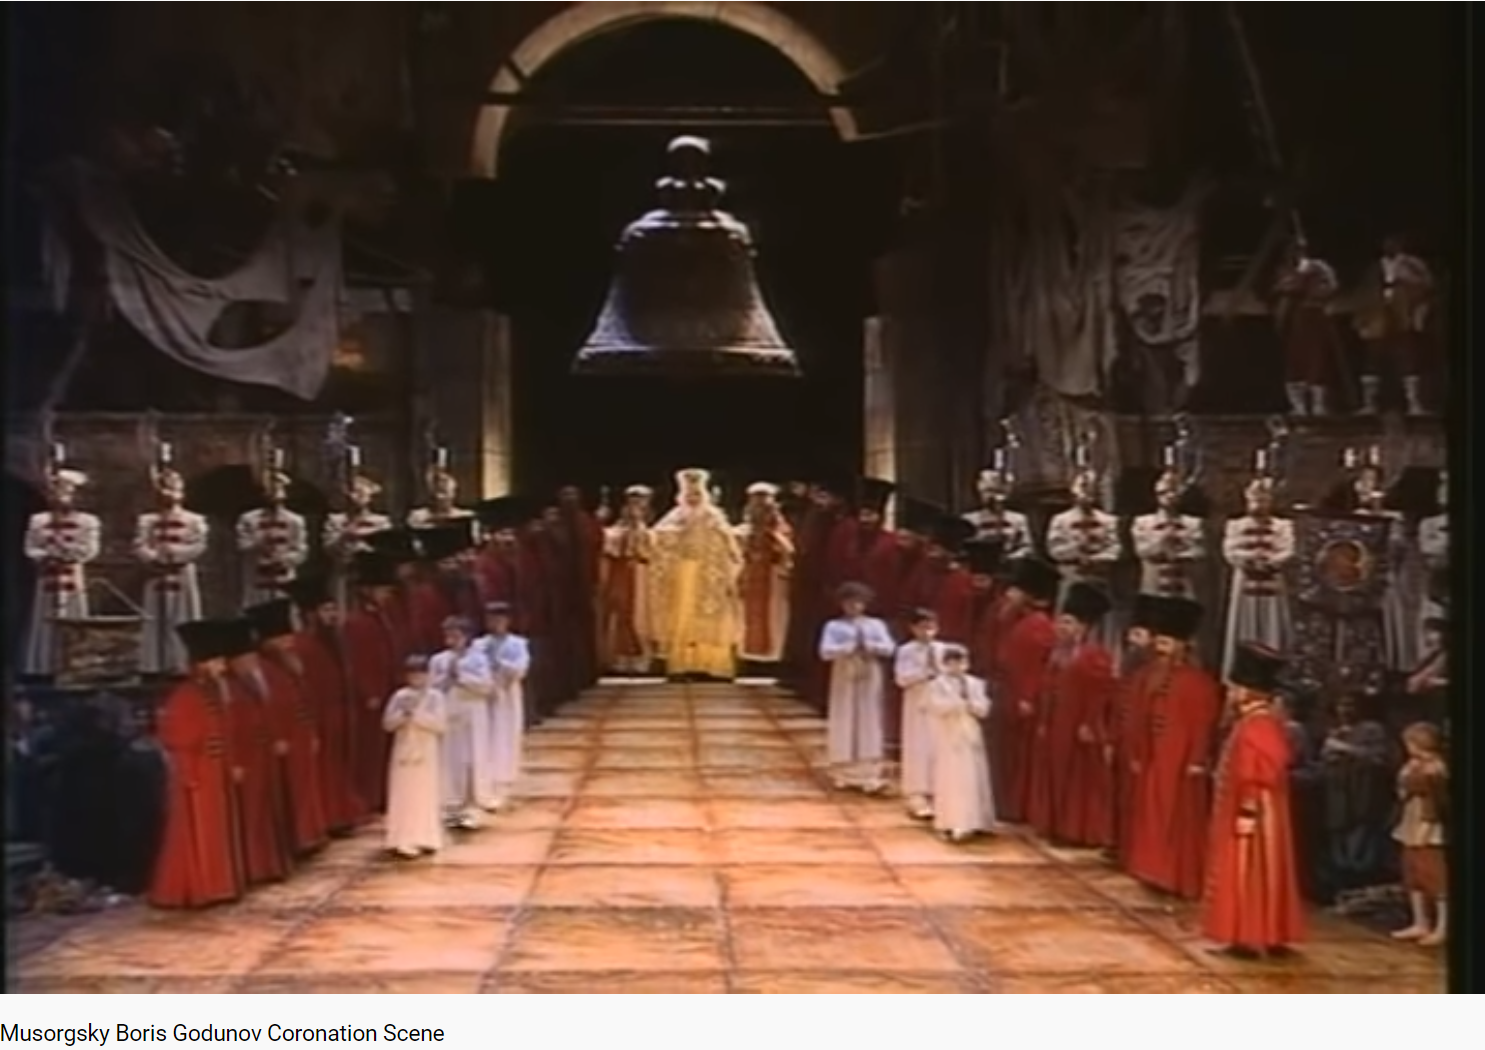 Moussorgski Boris Godounov Scène du couronnement